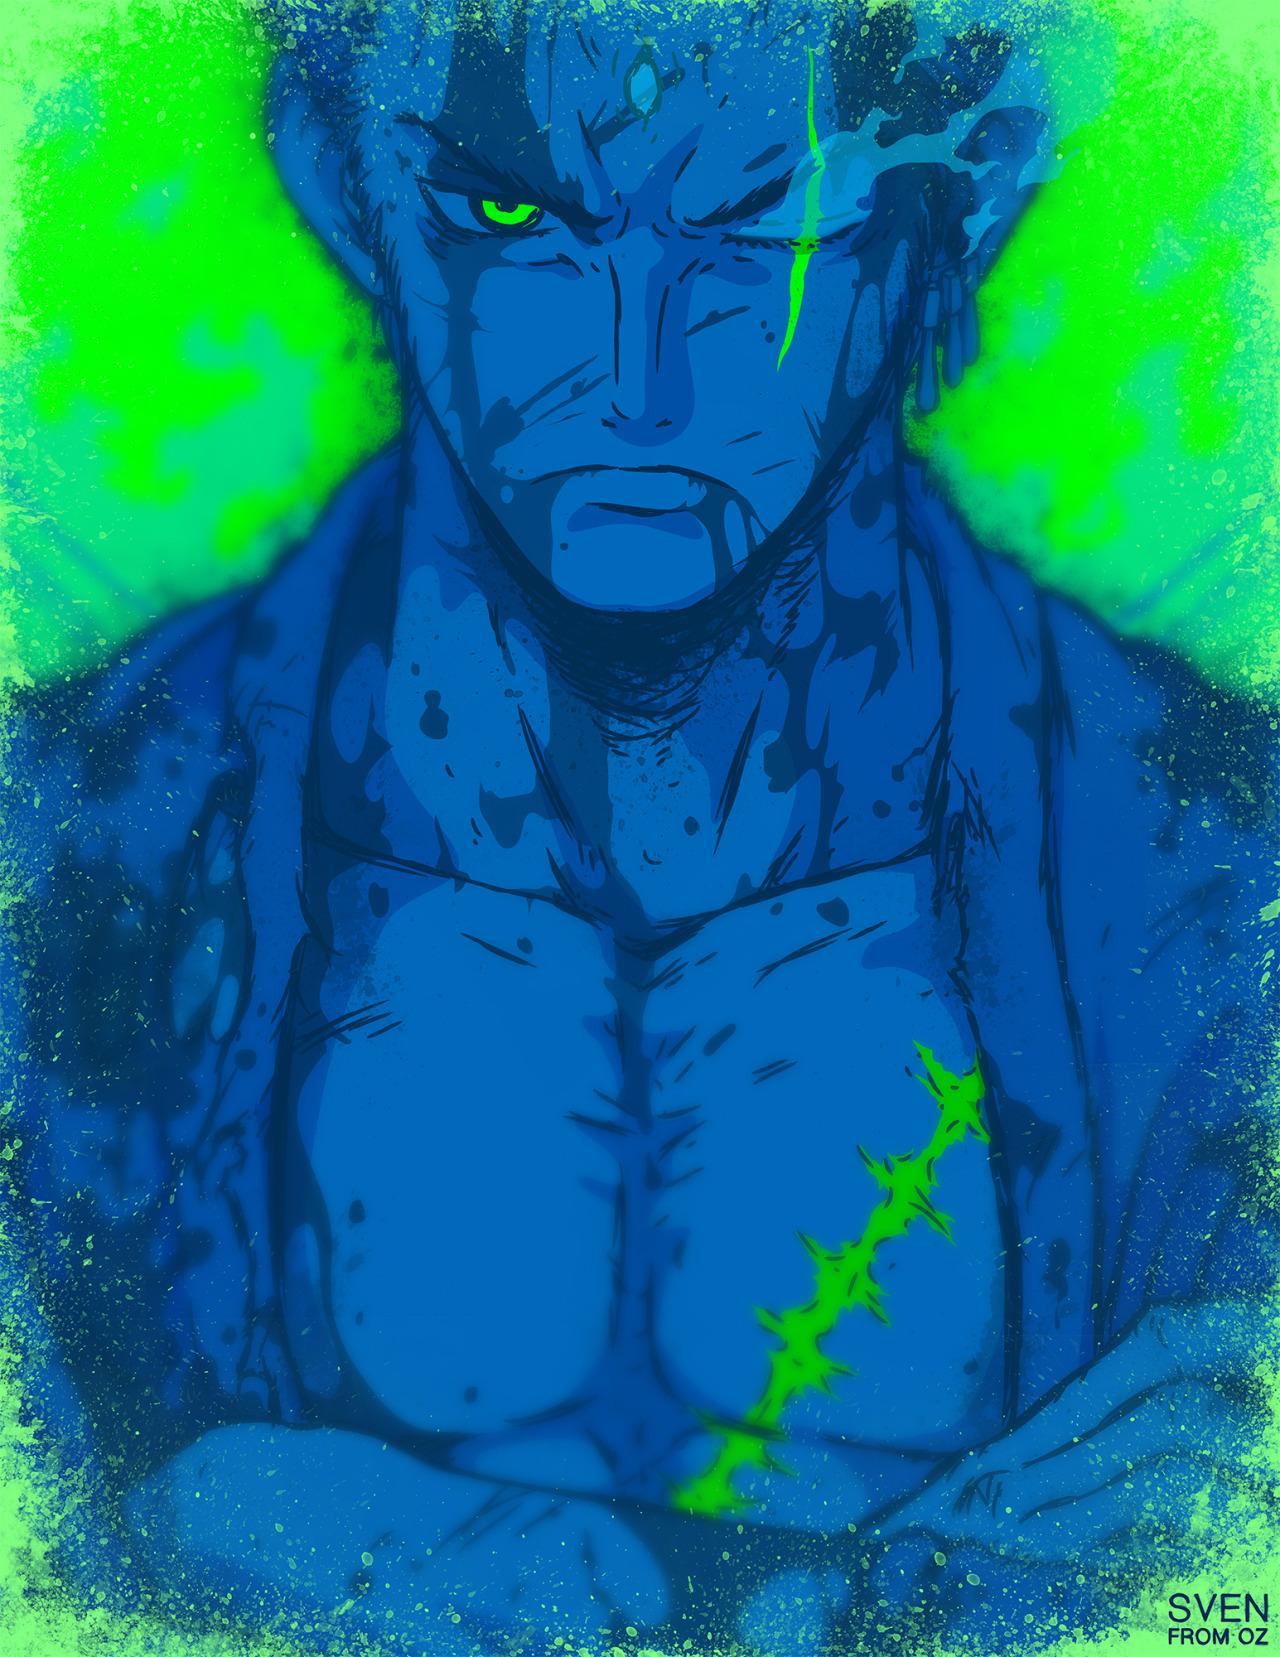 roronoa zoro one piece image 1960018 zerochan anime